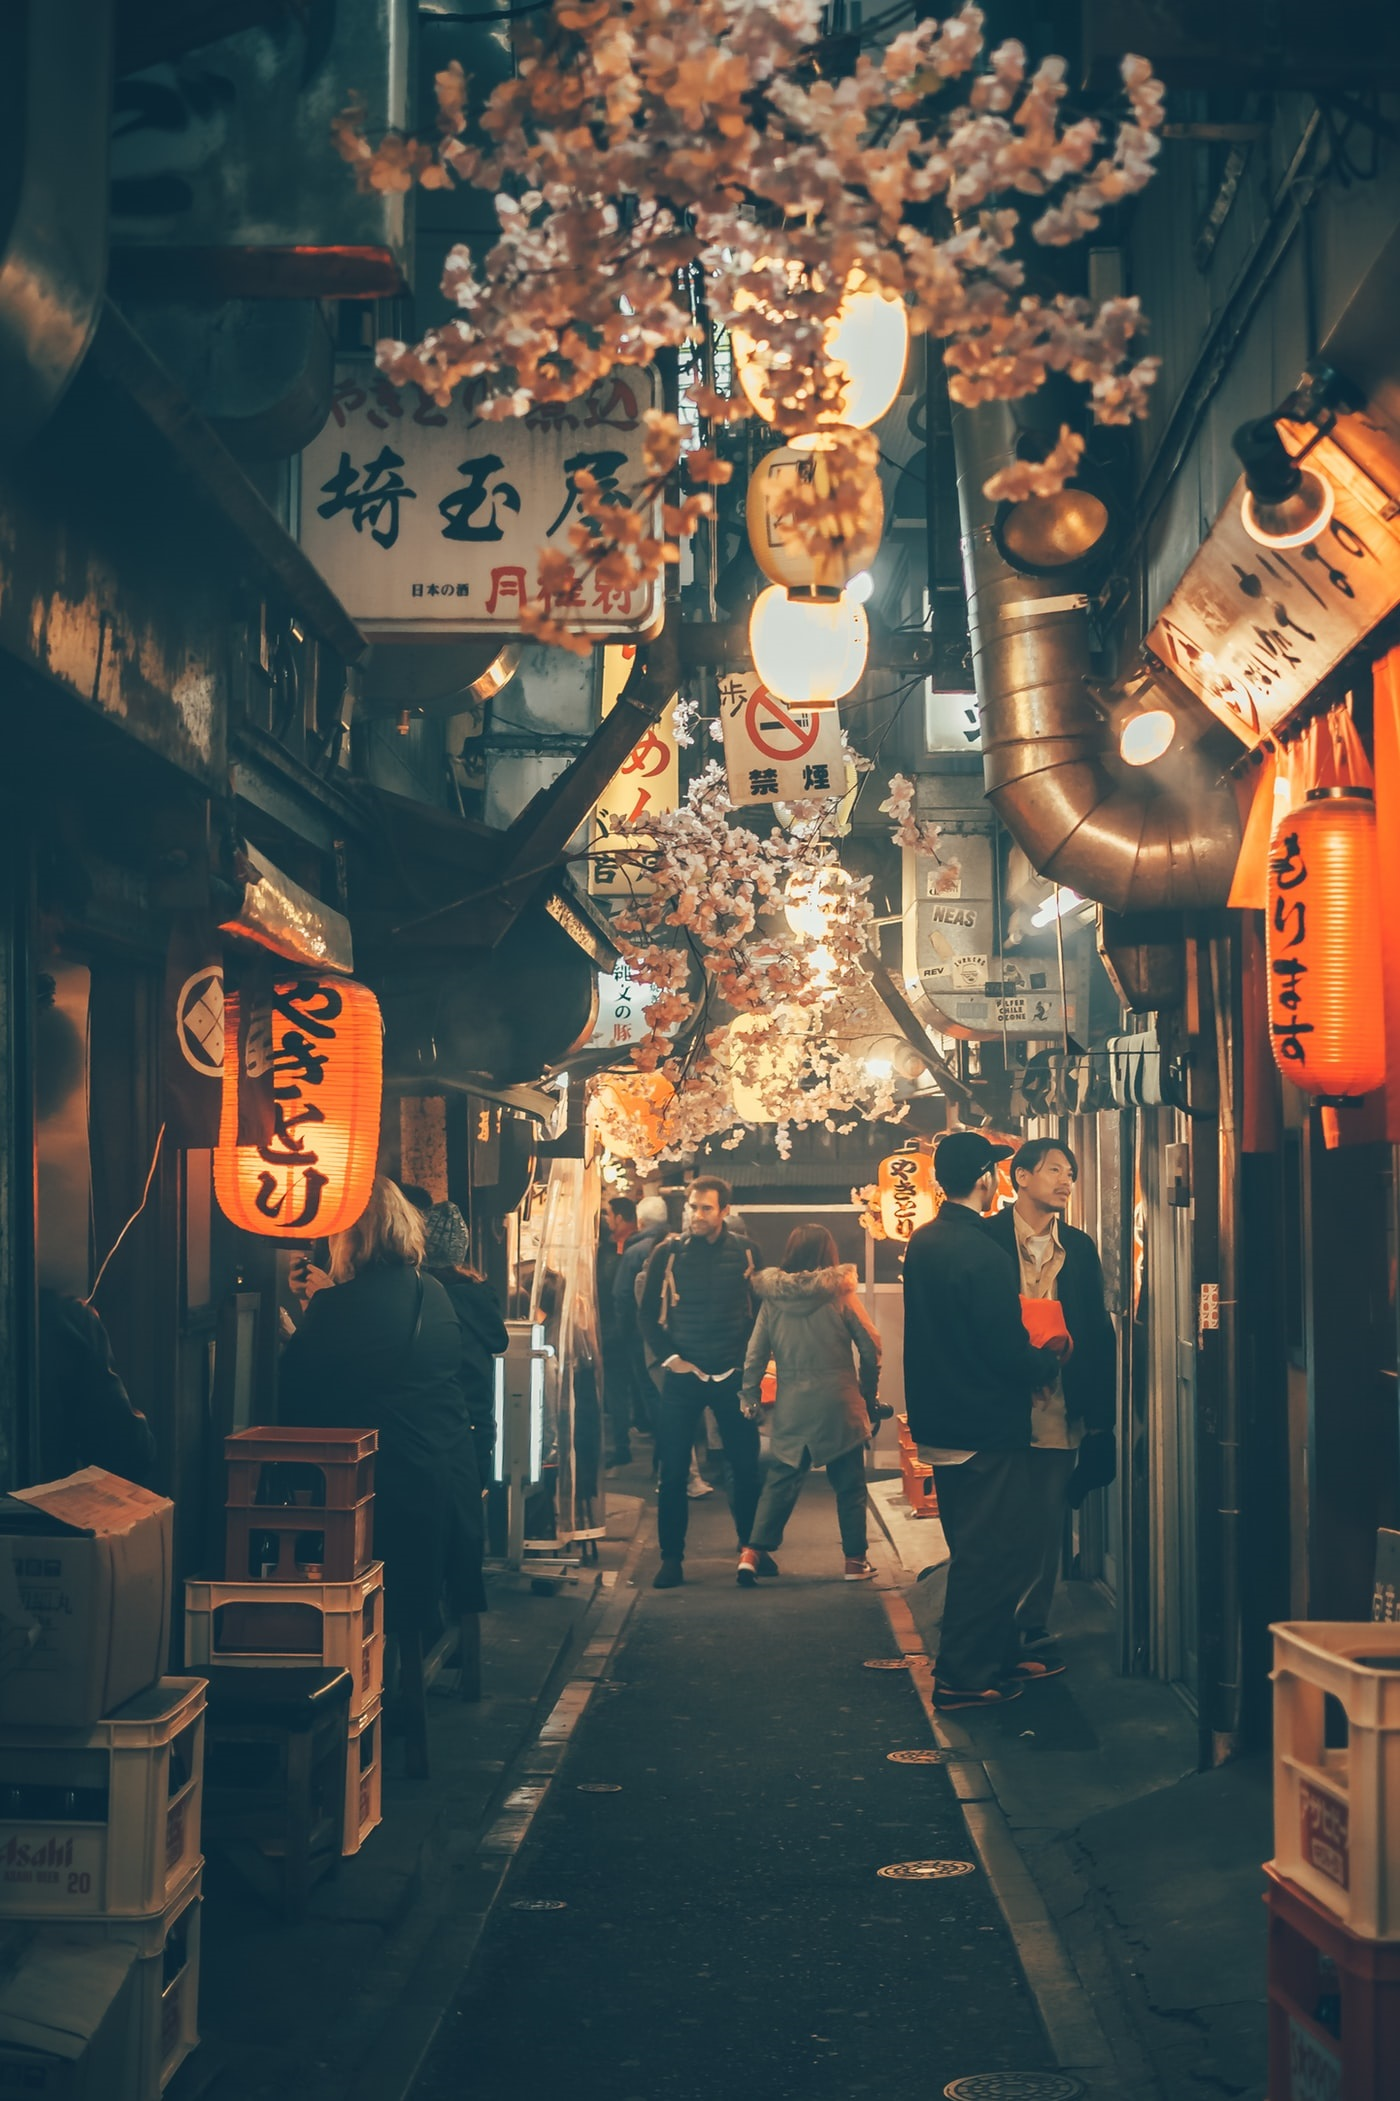 Japan real estate overseas real estate broker low cost real estate